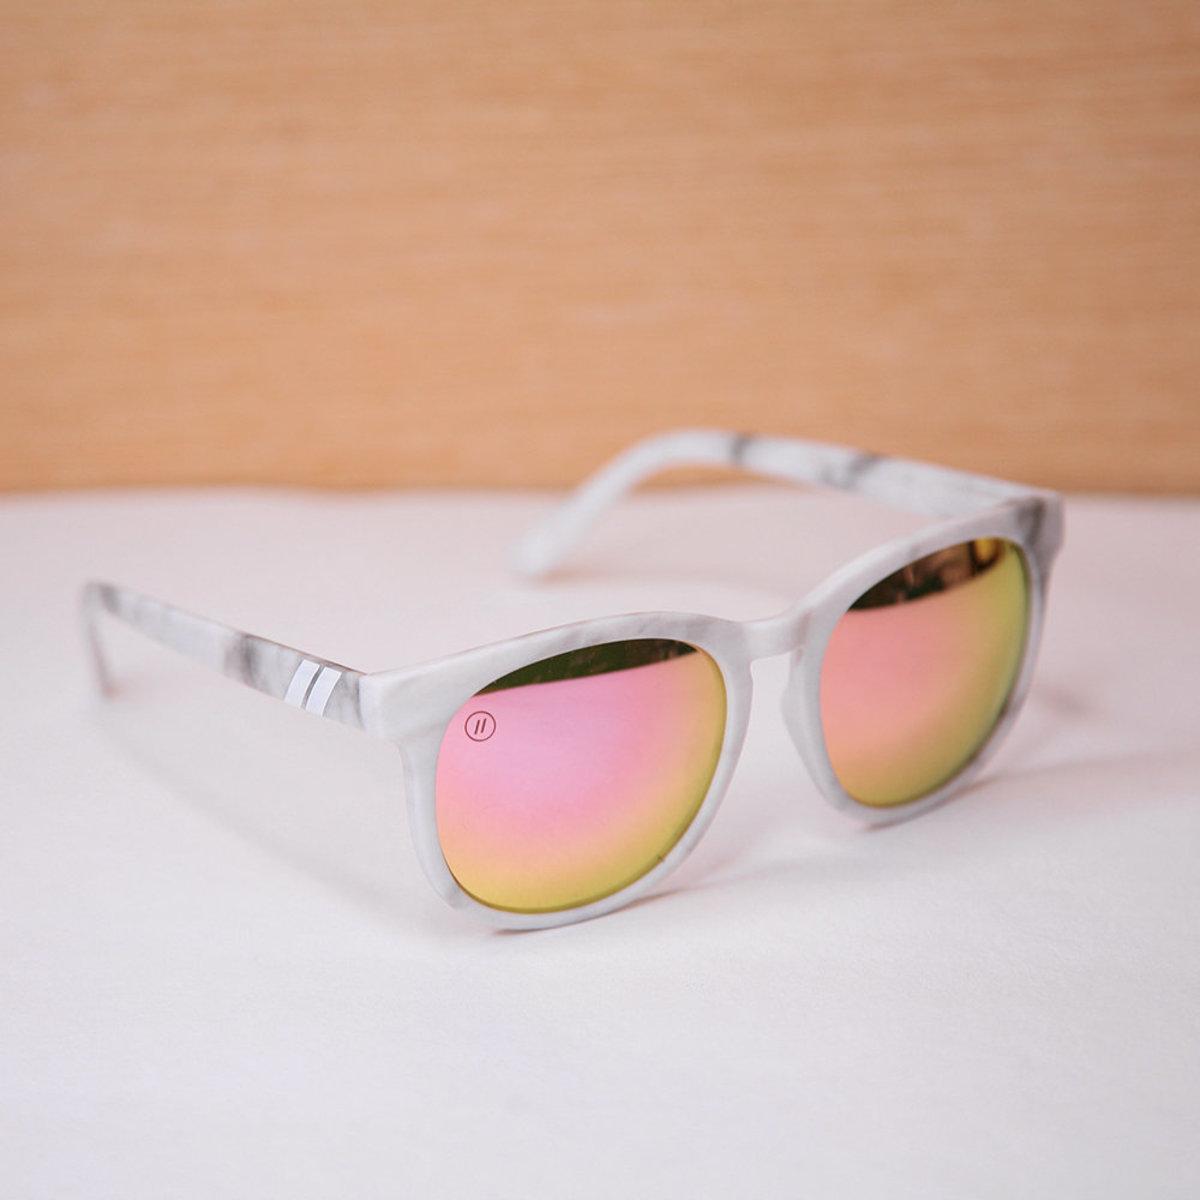 H Series // Alumni Queen Polarized Sunglasses